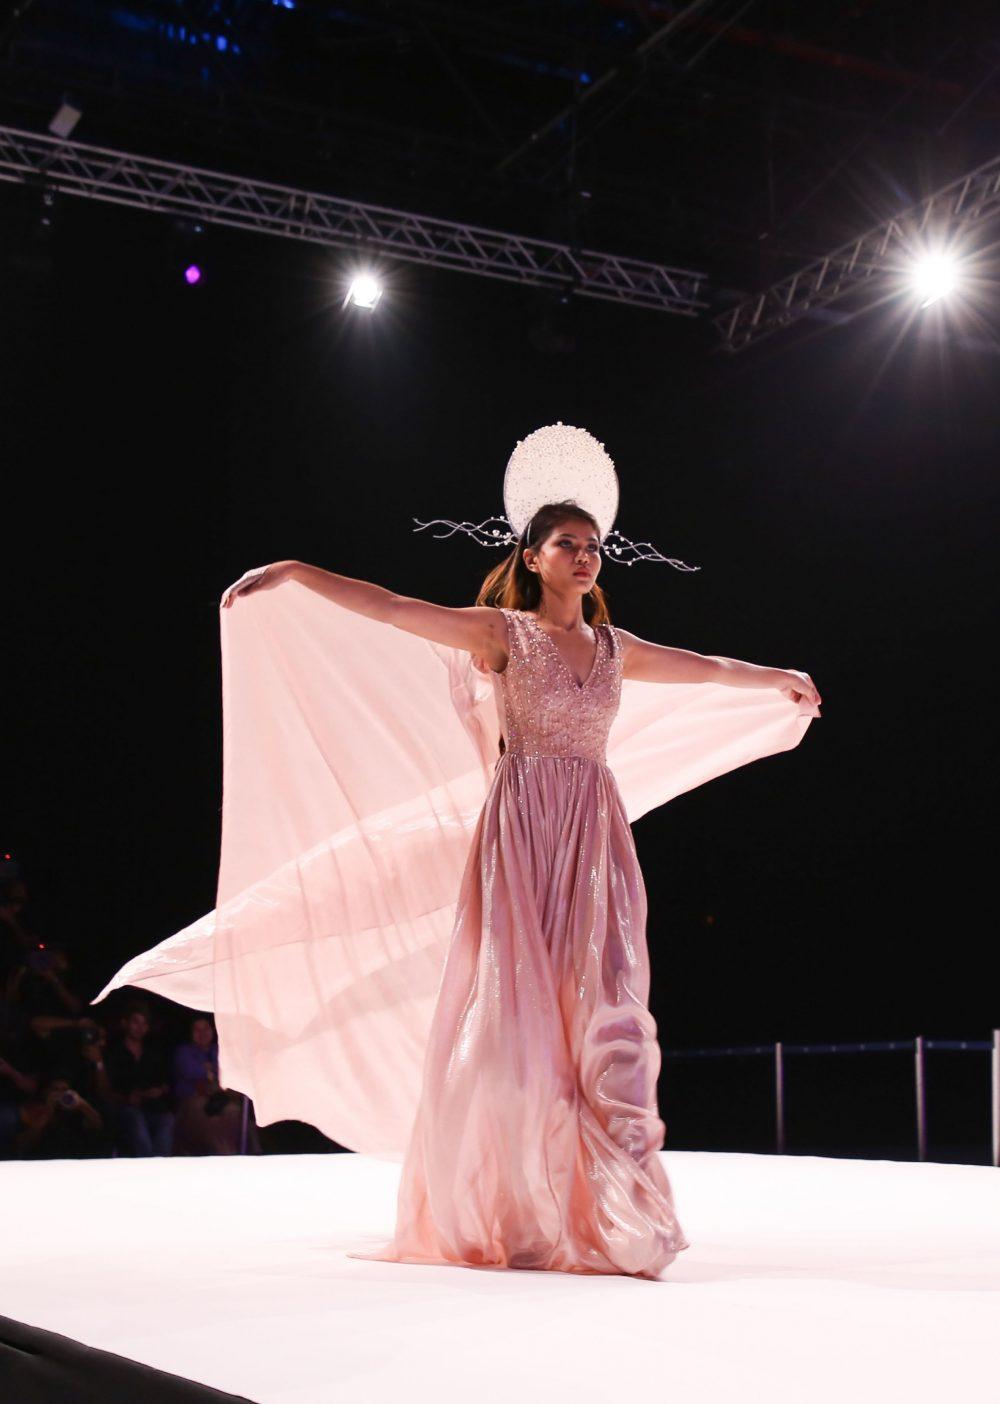 20190702 191839 e1562231483474 Stefan Đoković dobitnik nagrade na Fashion Week u u Dubaiju!